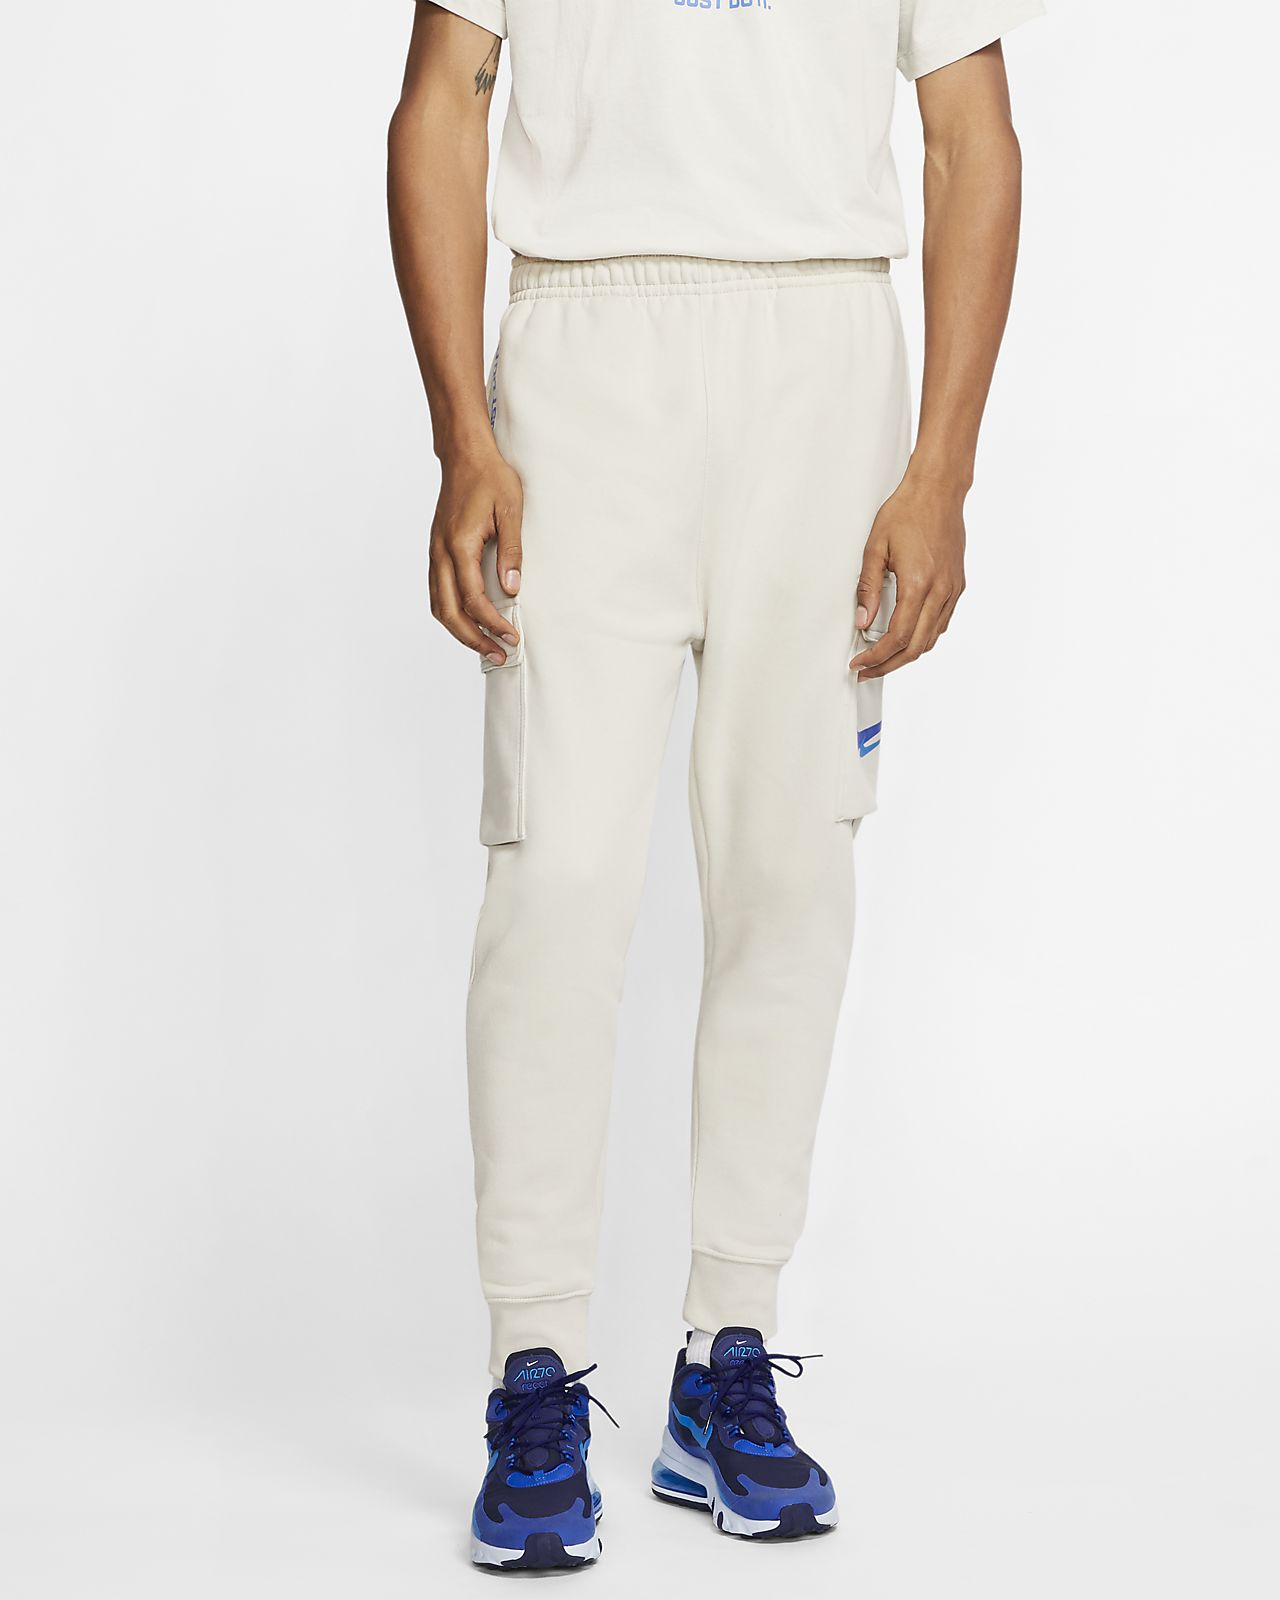 Pantaloni cargo stampati Nike Sportswear Swoosh - Uomo